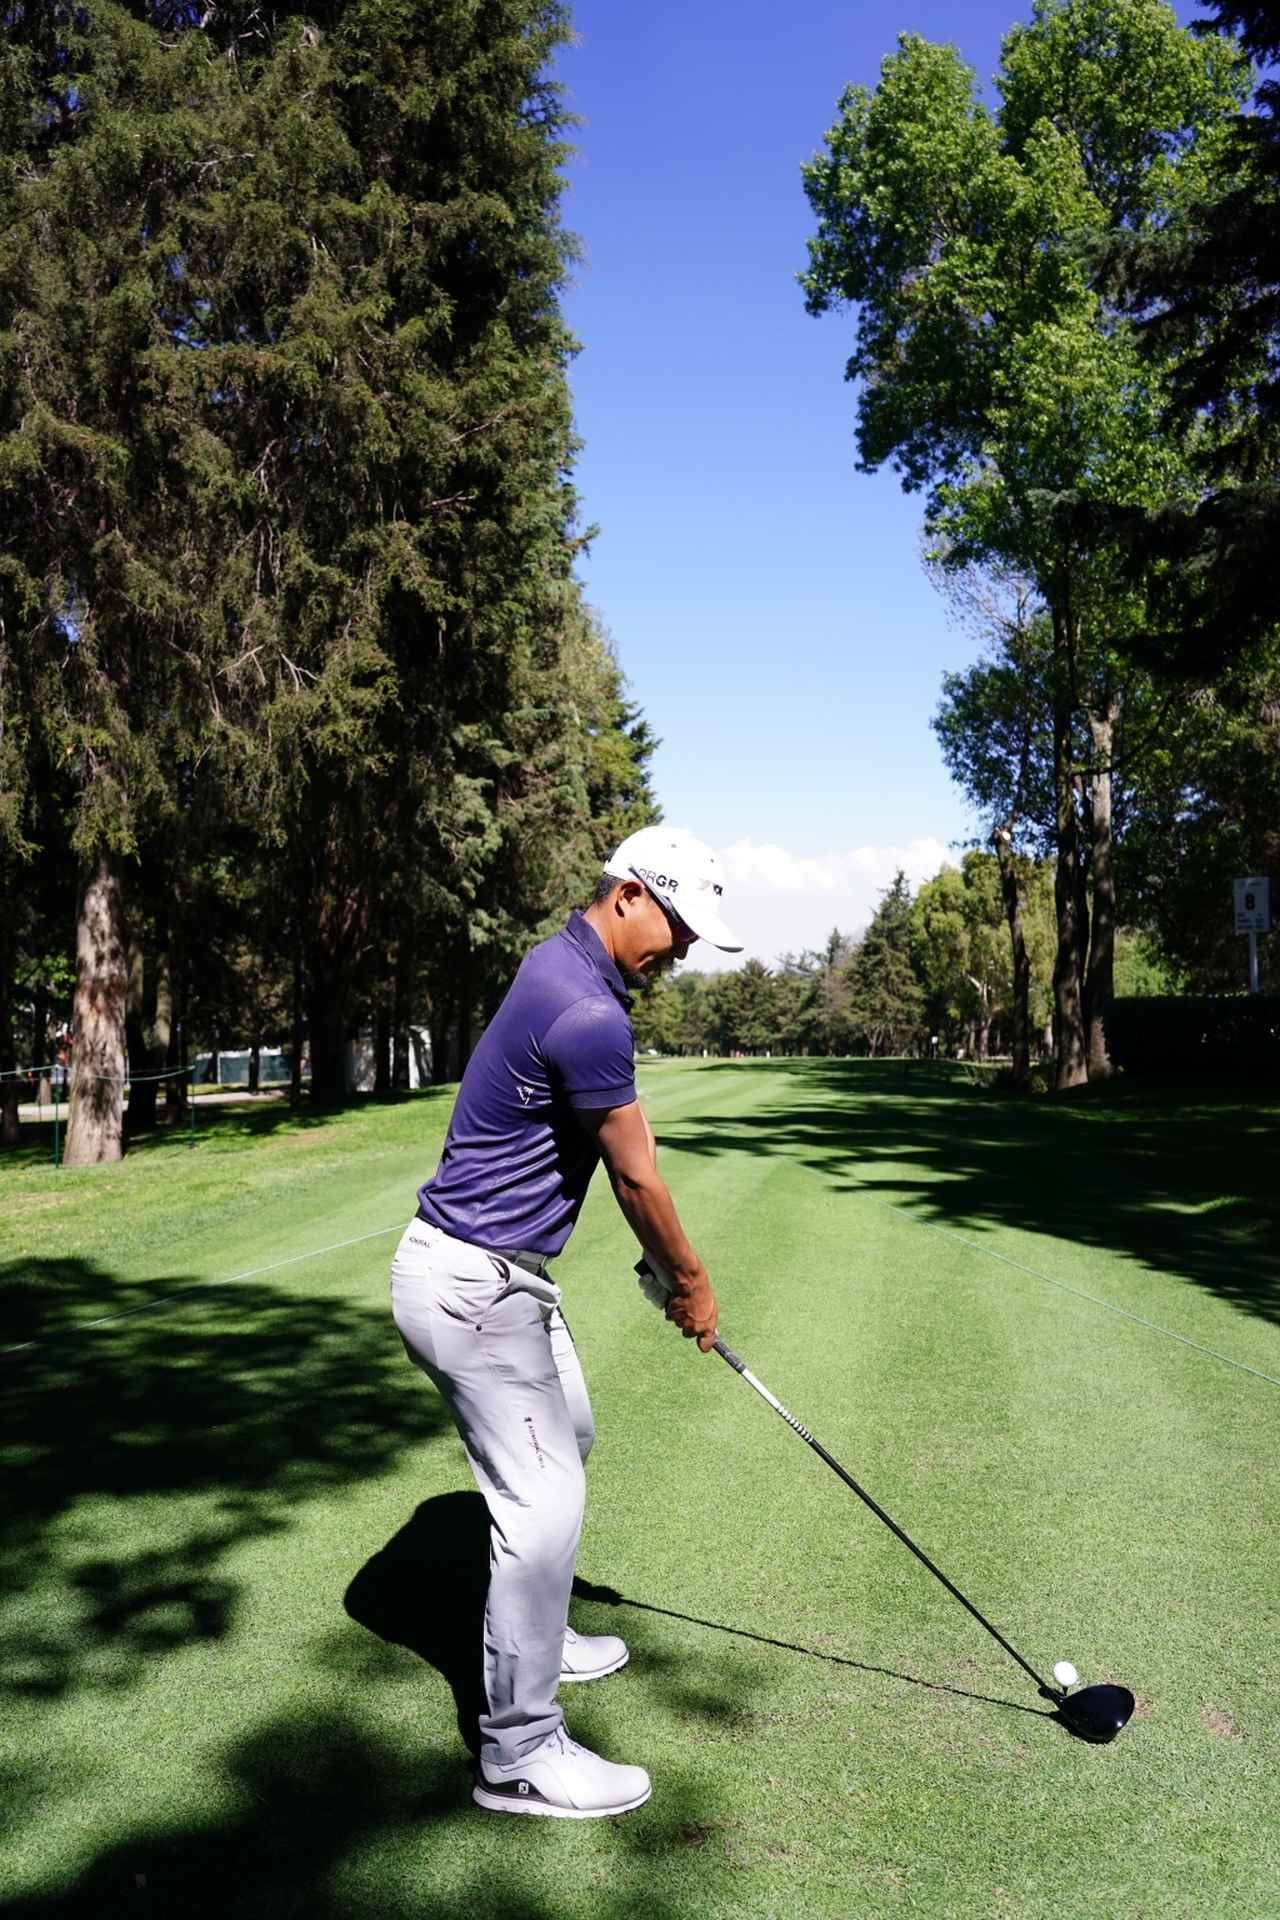 Images : 1番目の画像 - 小平智のドライバー連続写真 - みんなのゴルフダイジェスト